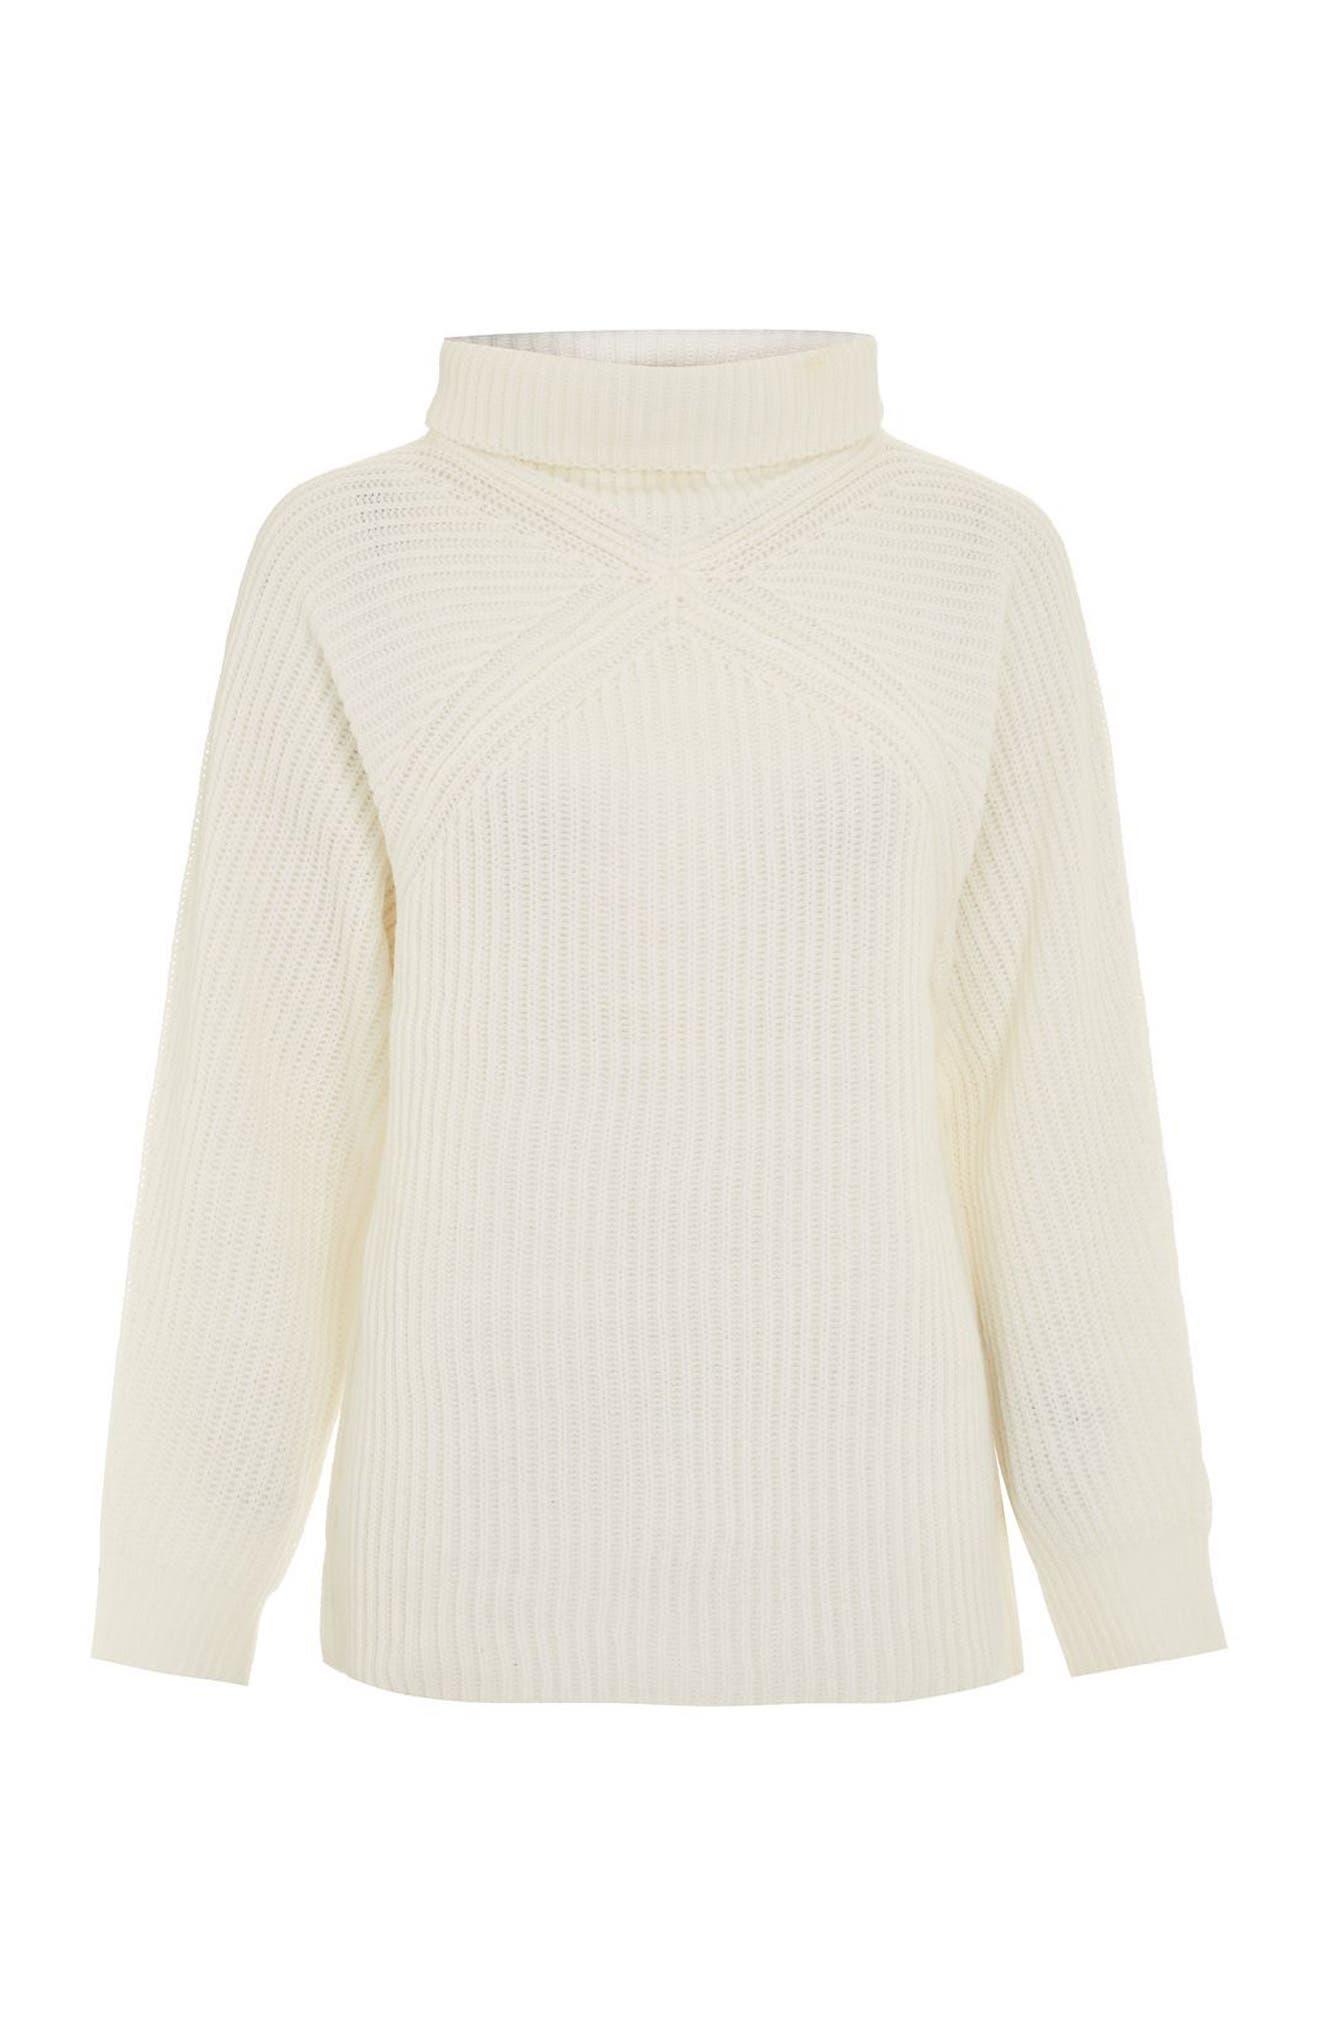 Diamond Stitch Turtleneck Sweater,                             Alternate thumbnail 4, color,                             900